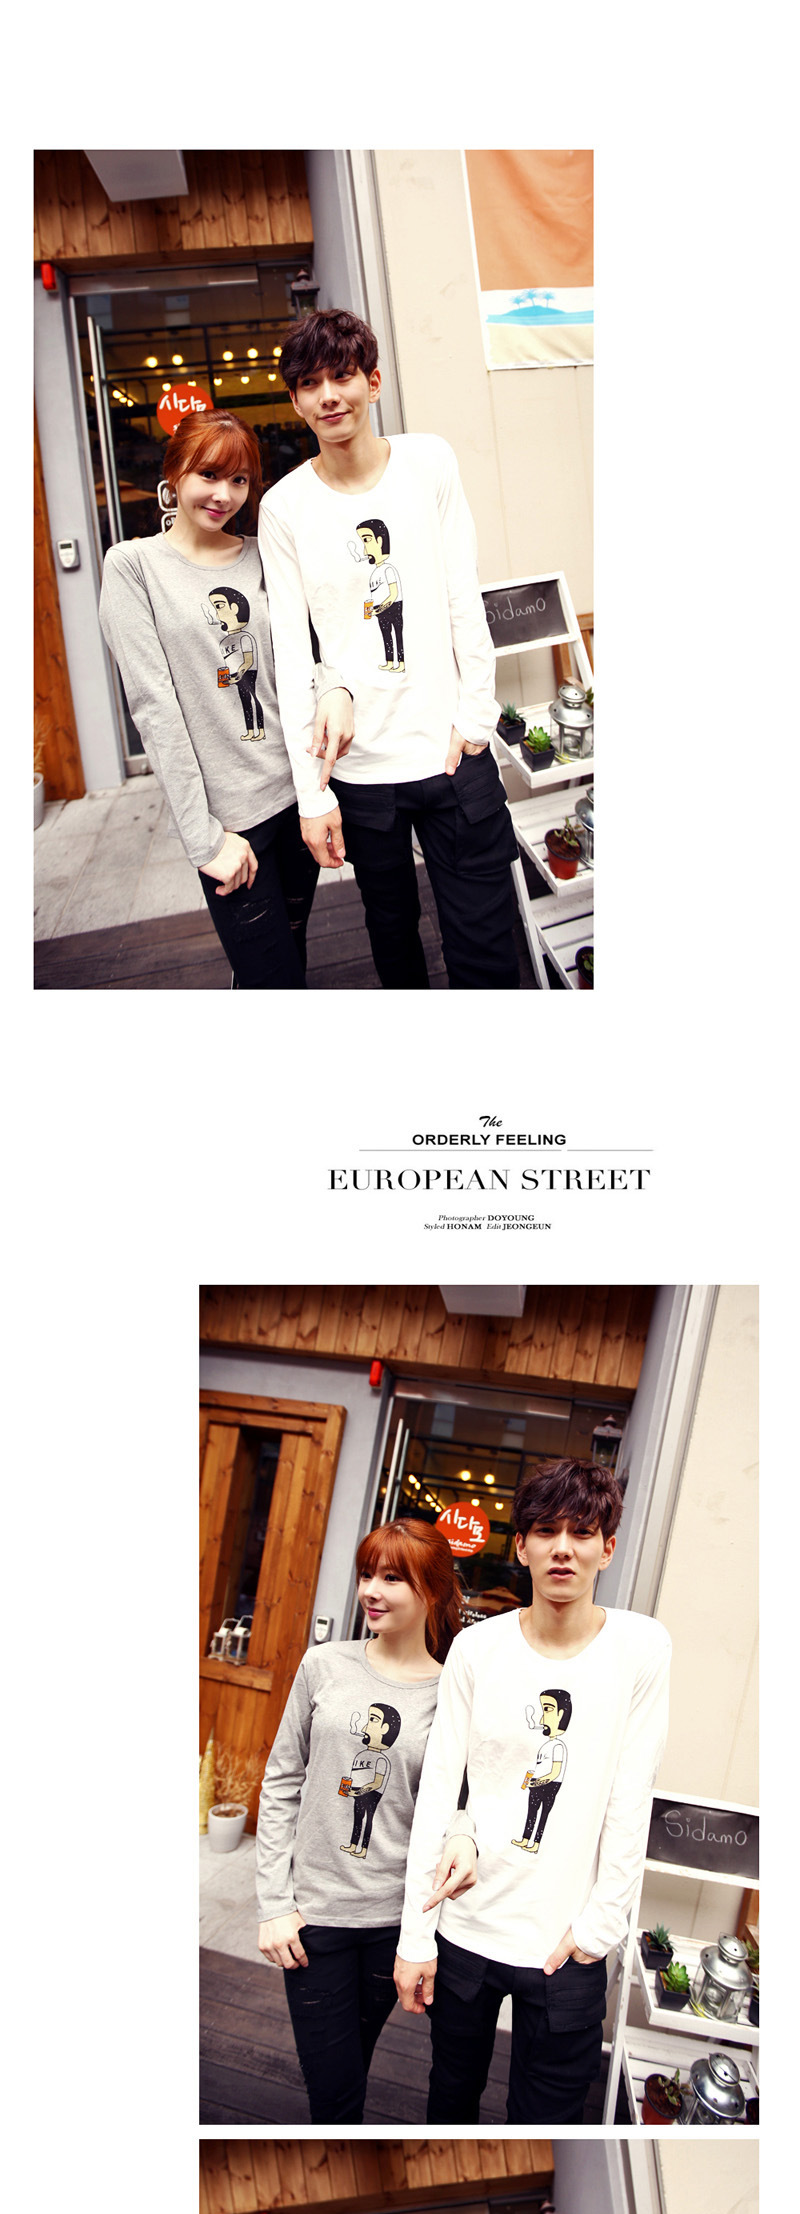 c2潮朝 拿烟斗的小人图案印花 时尚修身男女百搭情侣长袖t恤 白色 s